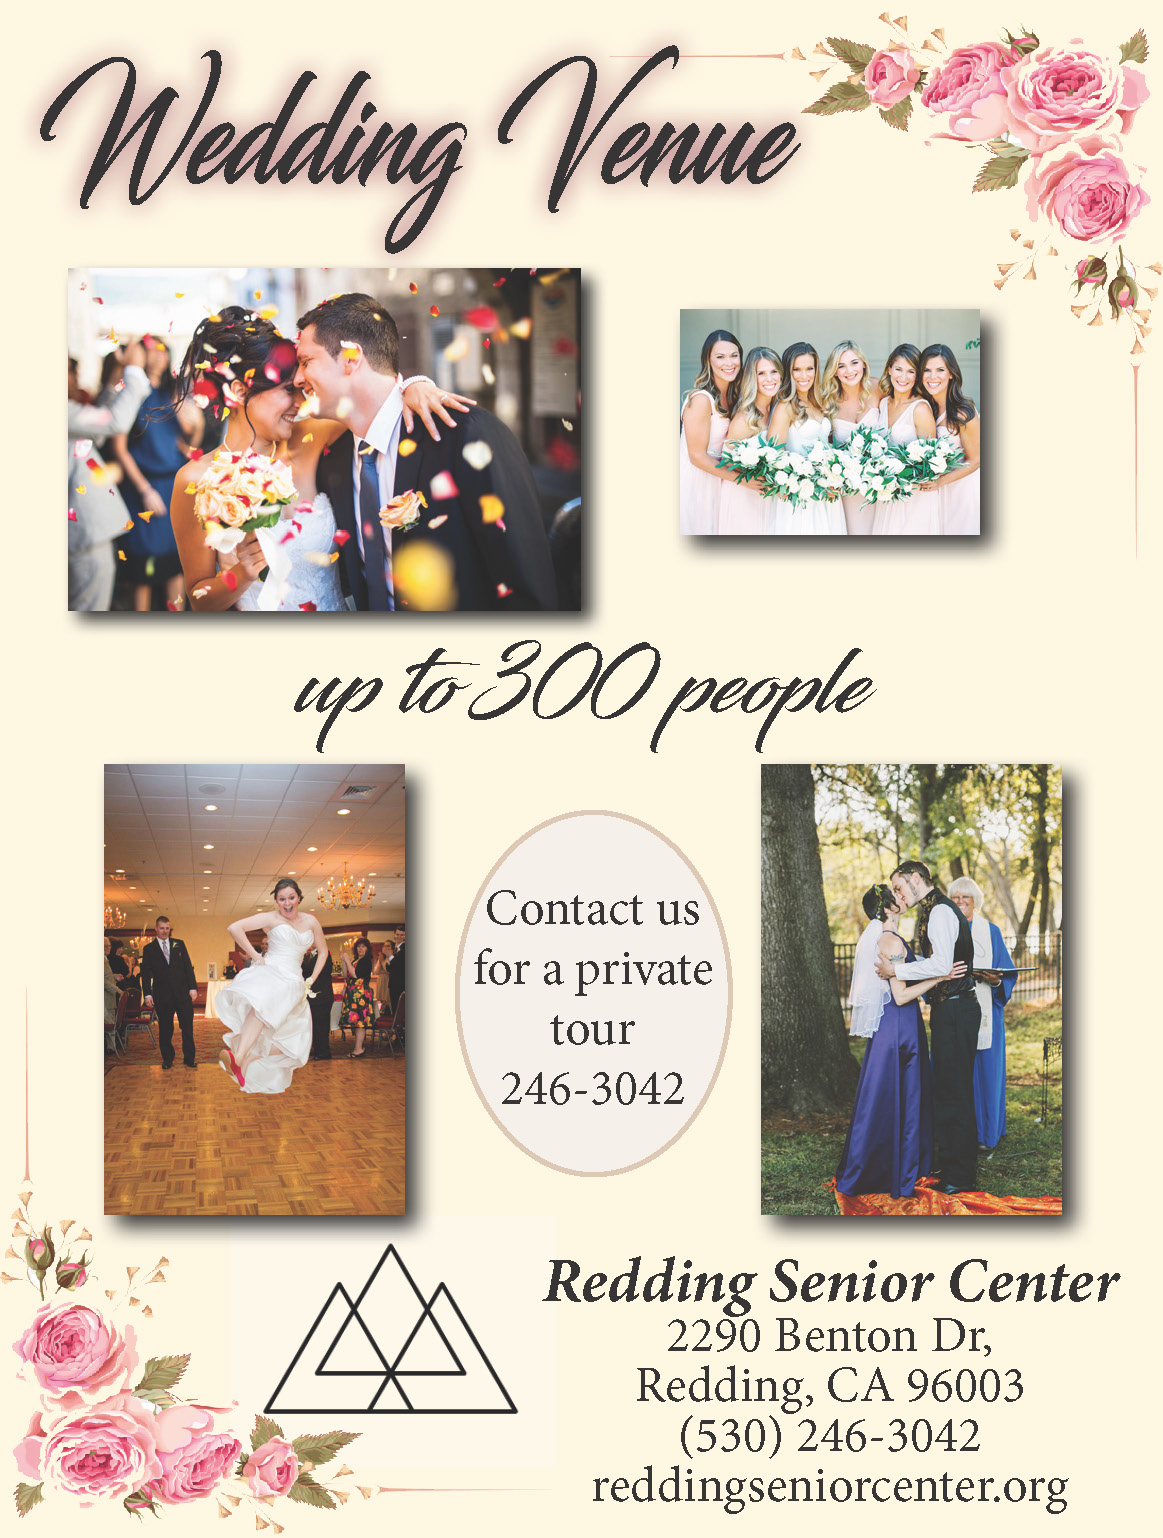 Redding Senior Center Wedding Venue.jpg